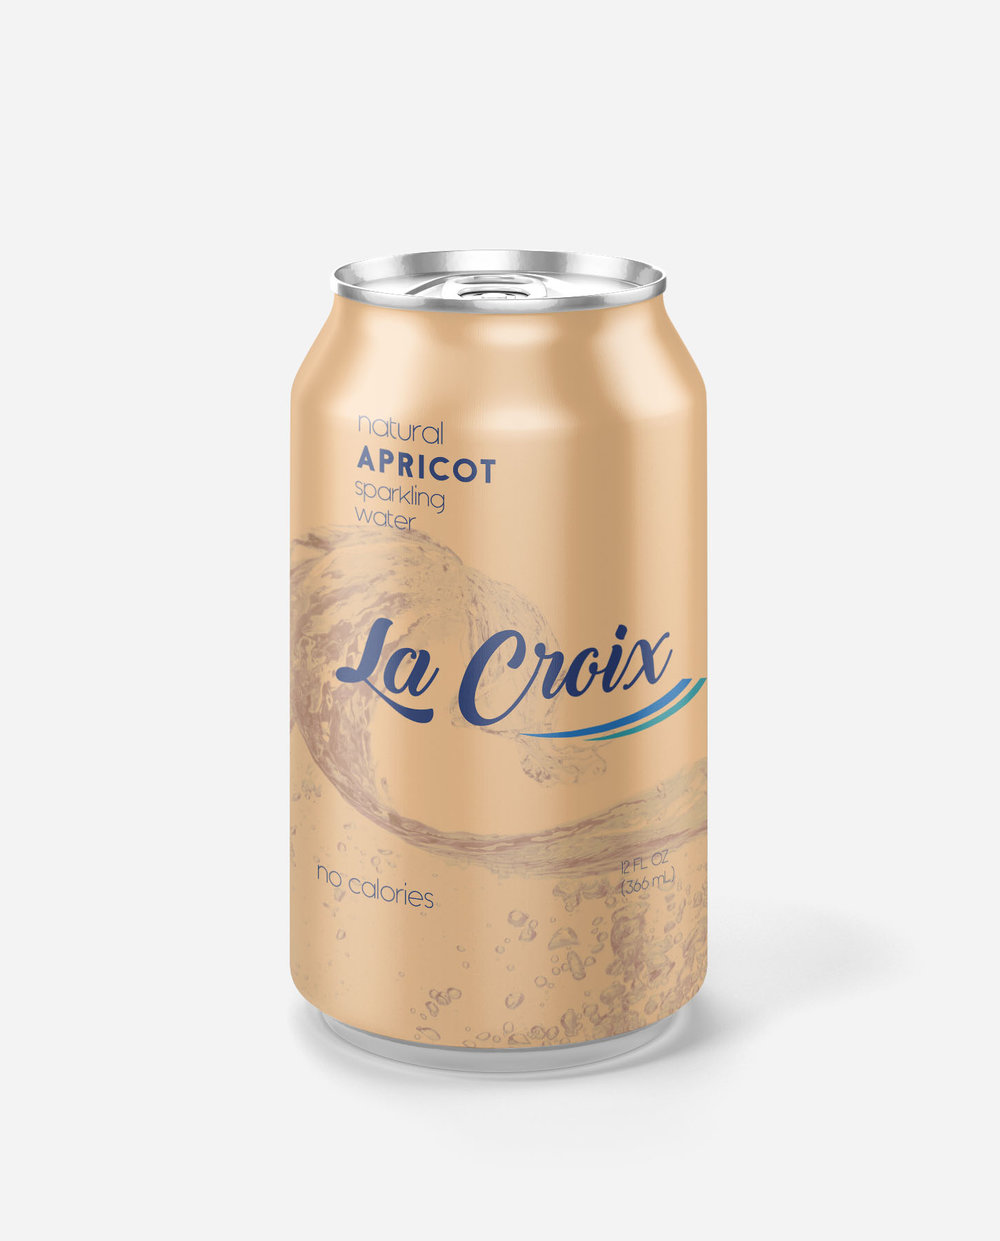 lacroix_apricot.jpg